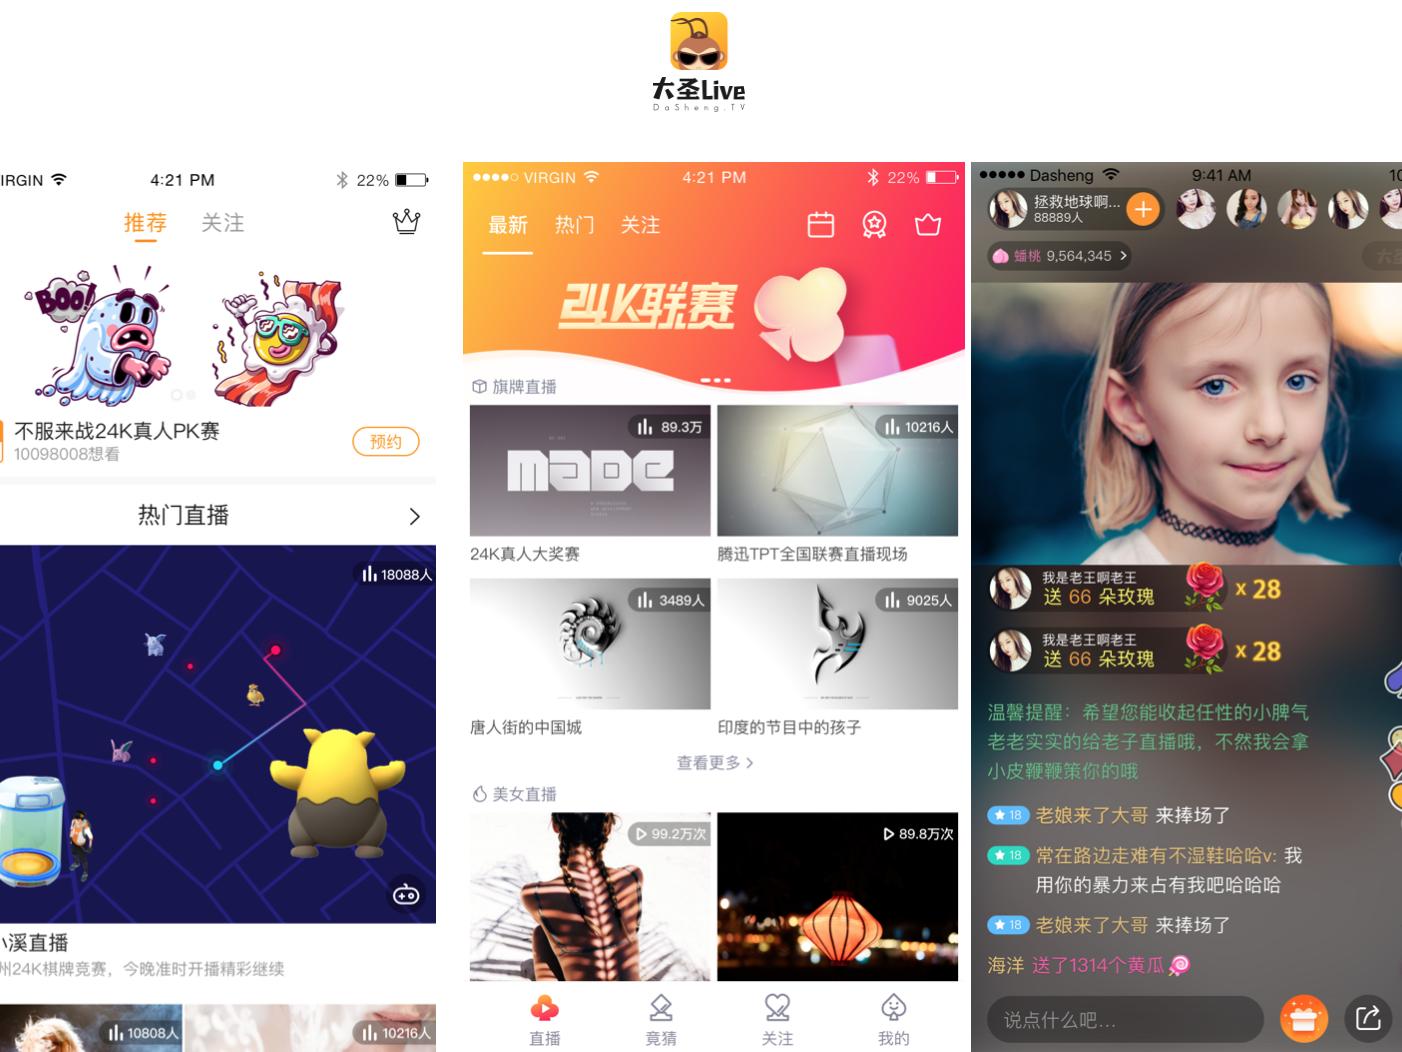 live app ui desing banner ui guide vector gui ux icon logo branding design sketch app ui